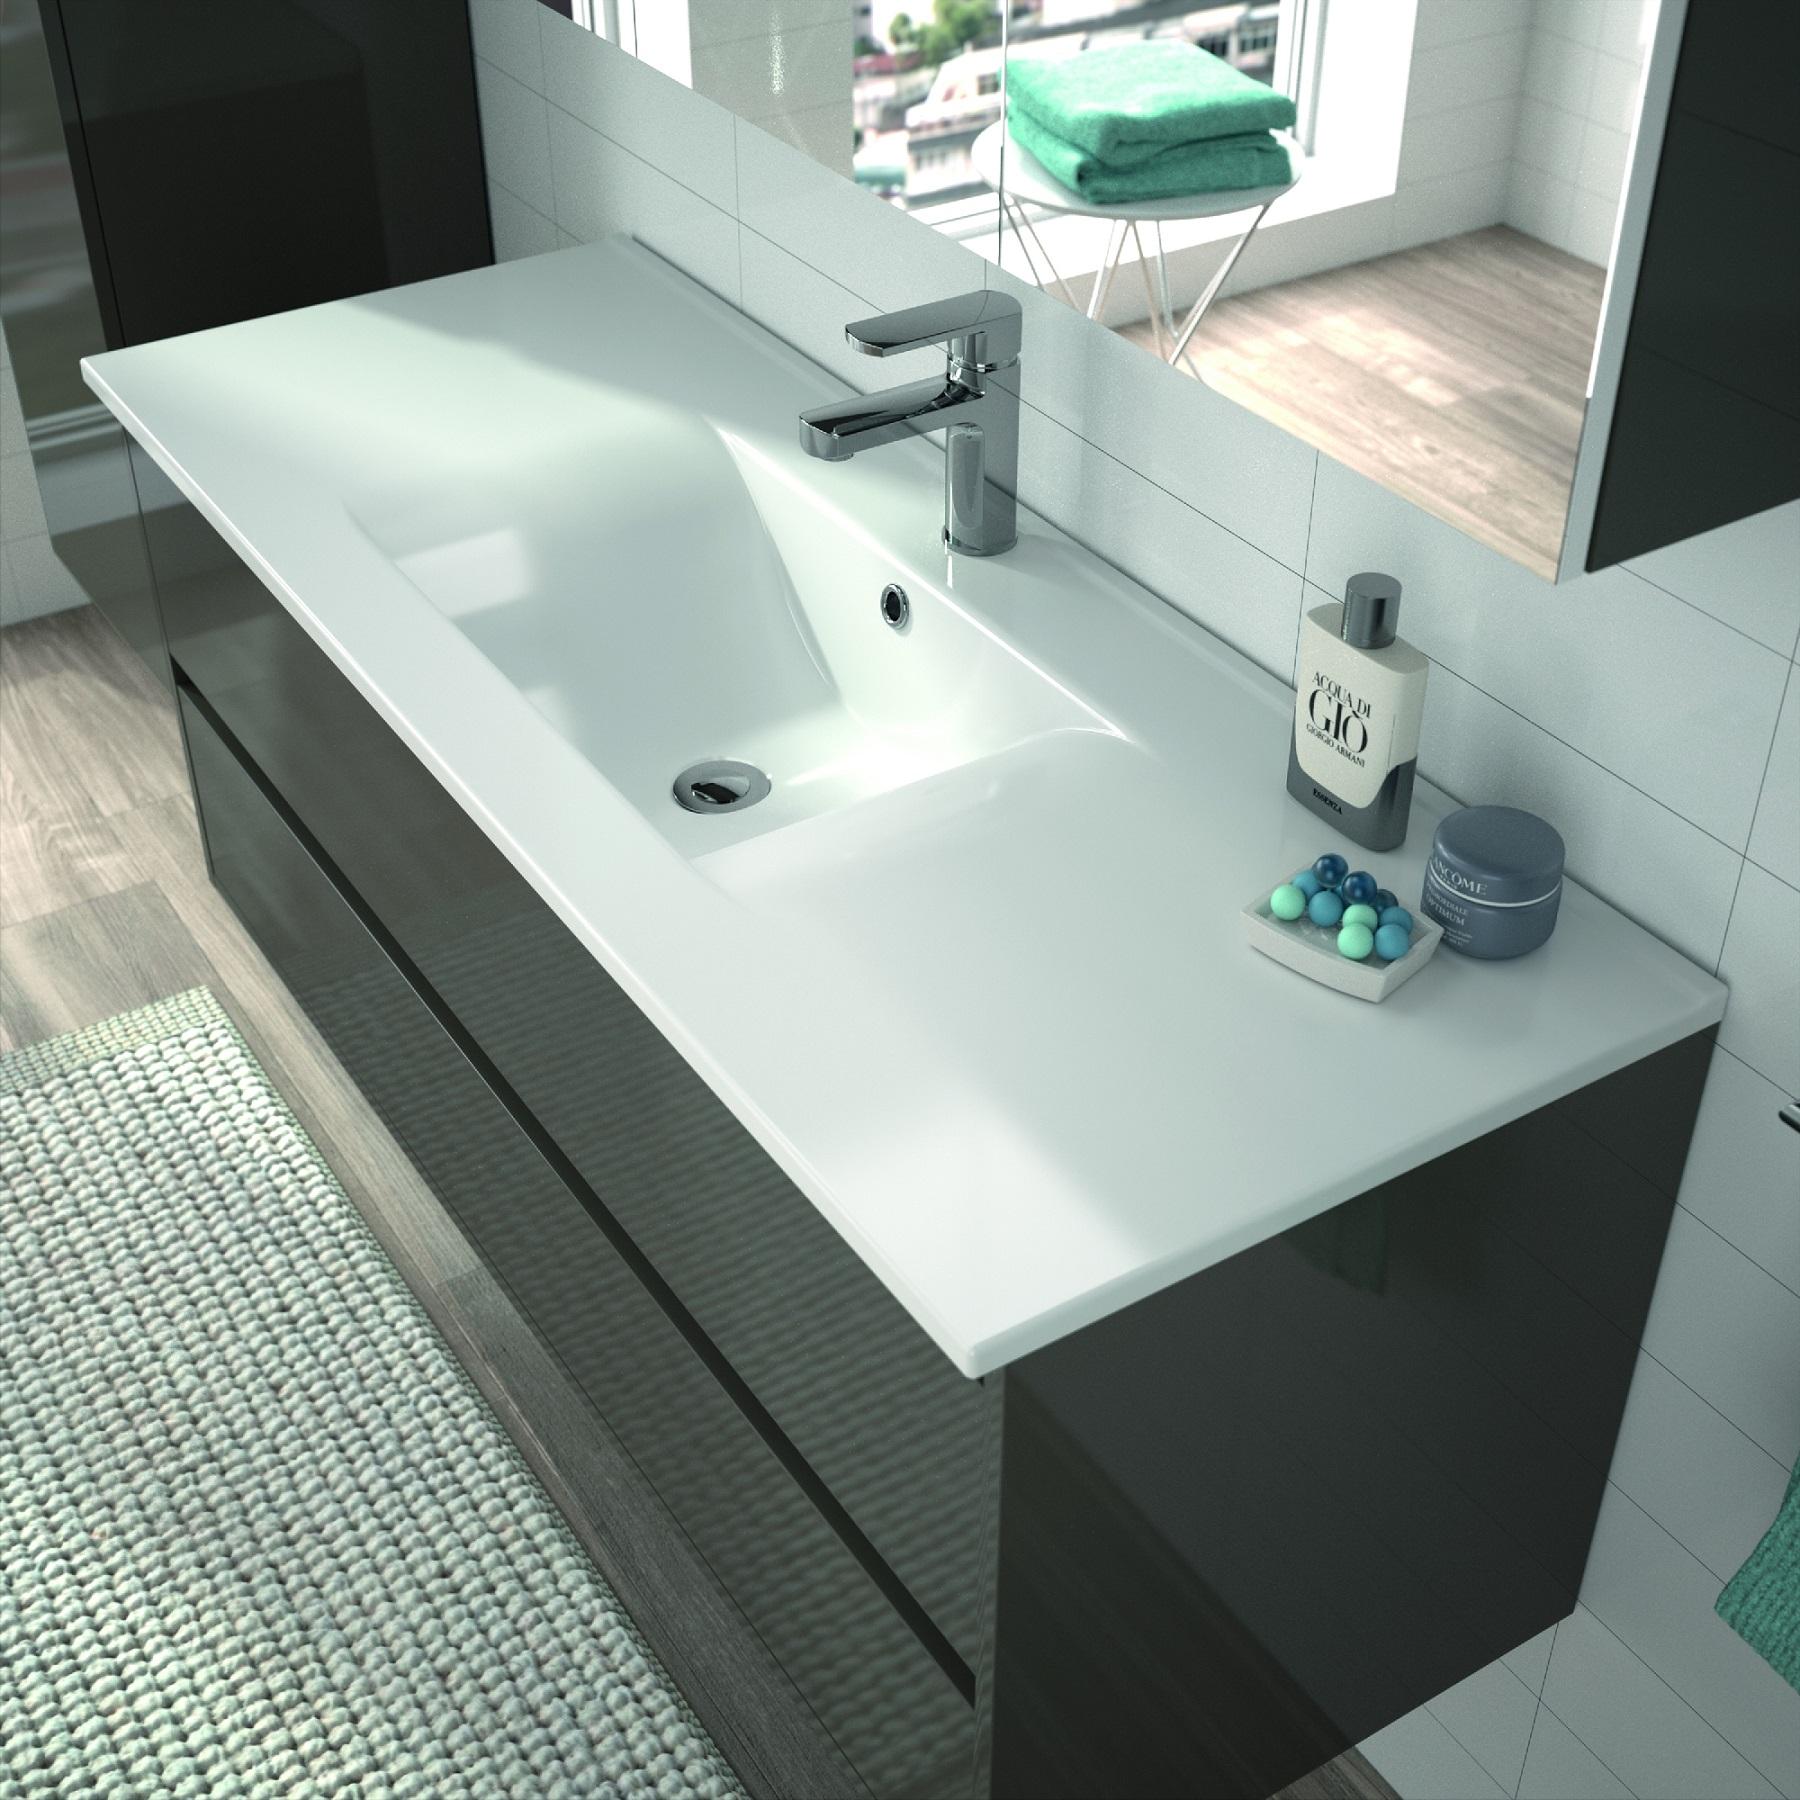 allibert badm bel badm belset vormontiert grau glanz spiegel waschtisch 120 cm 4260458244647 ebay. Black Bedroom Furniture Sets. Home Design Ideas